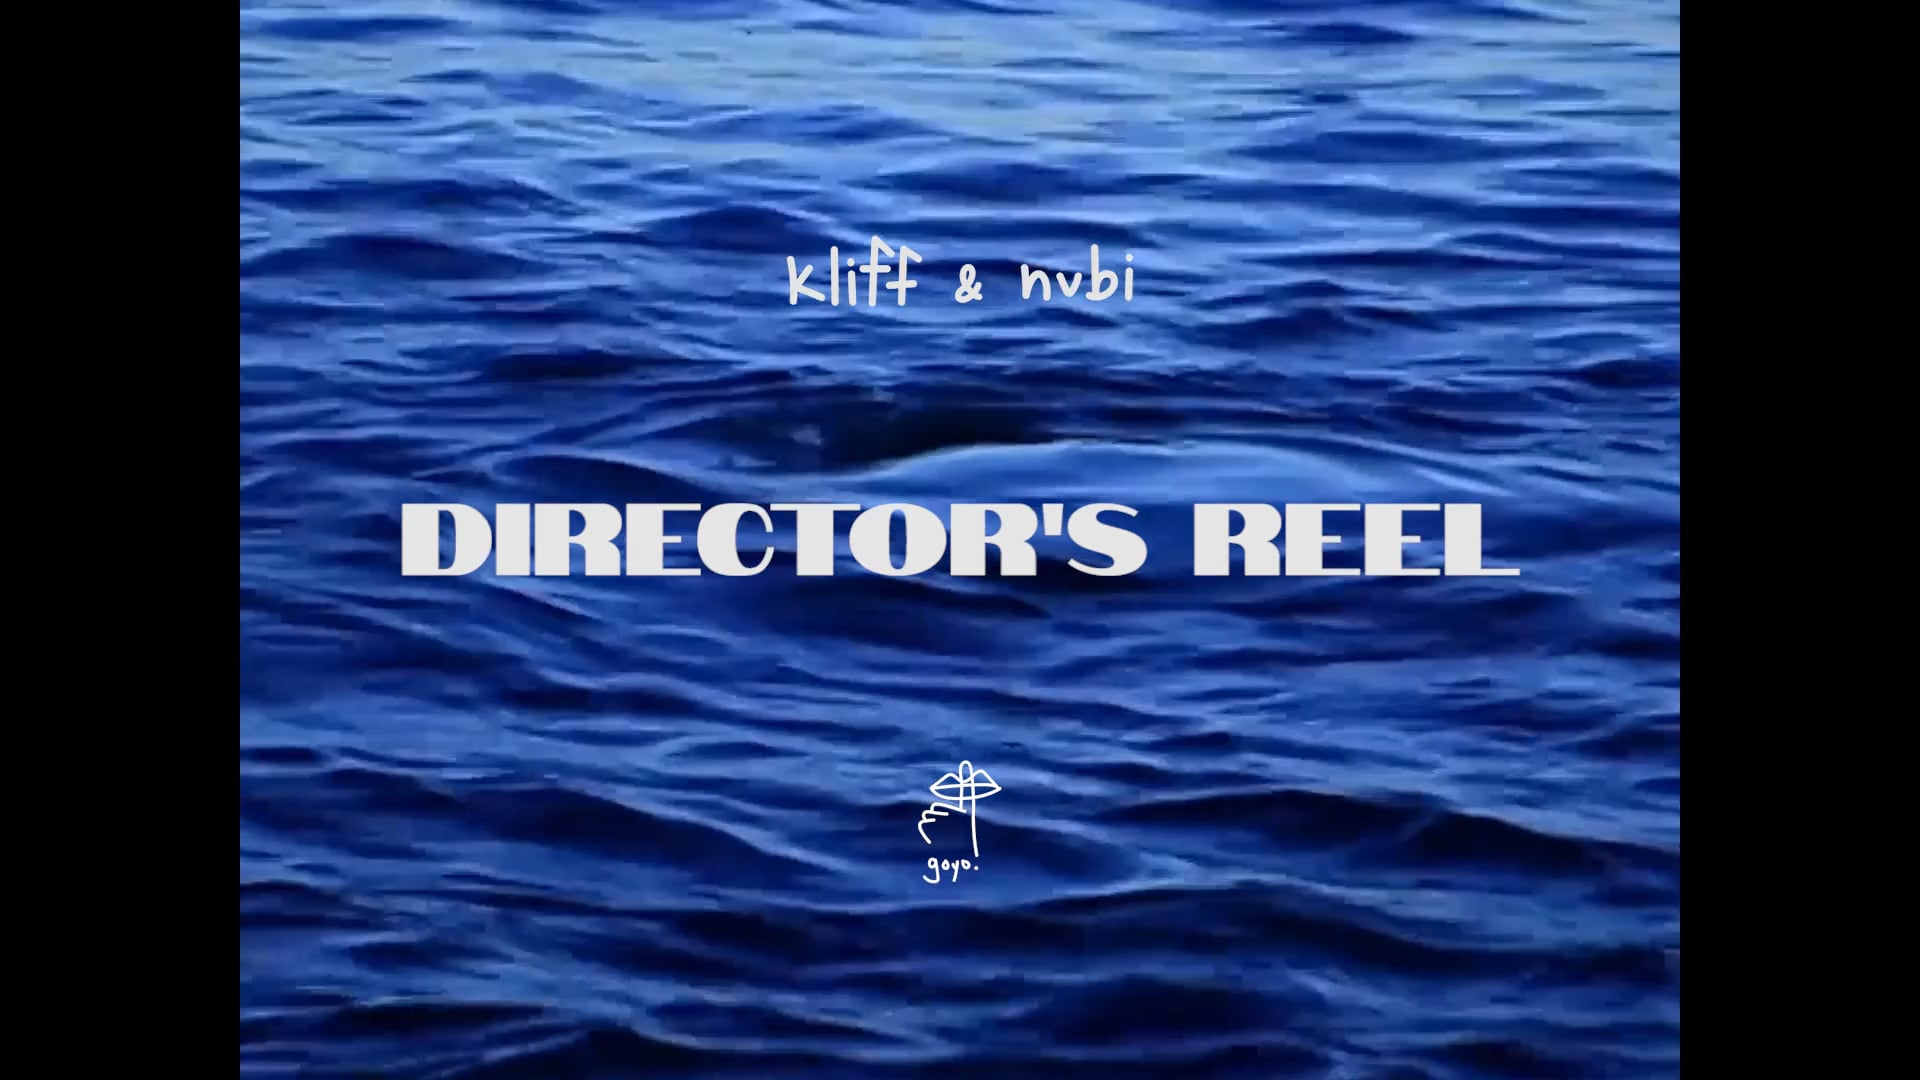 Kliff & Nvbi - Director's Reel 2021